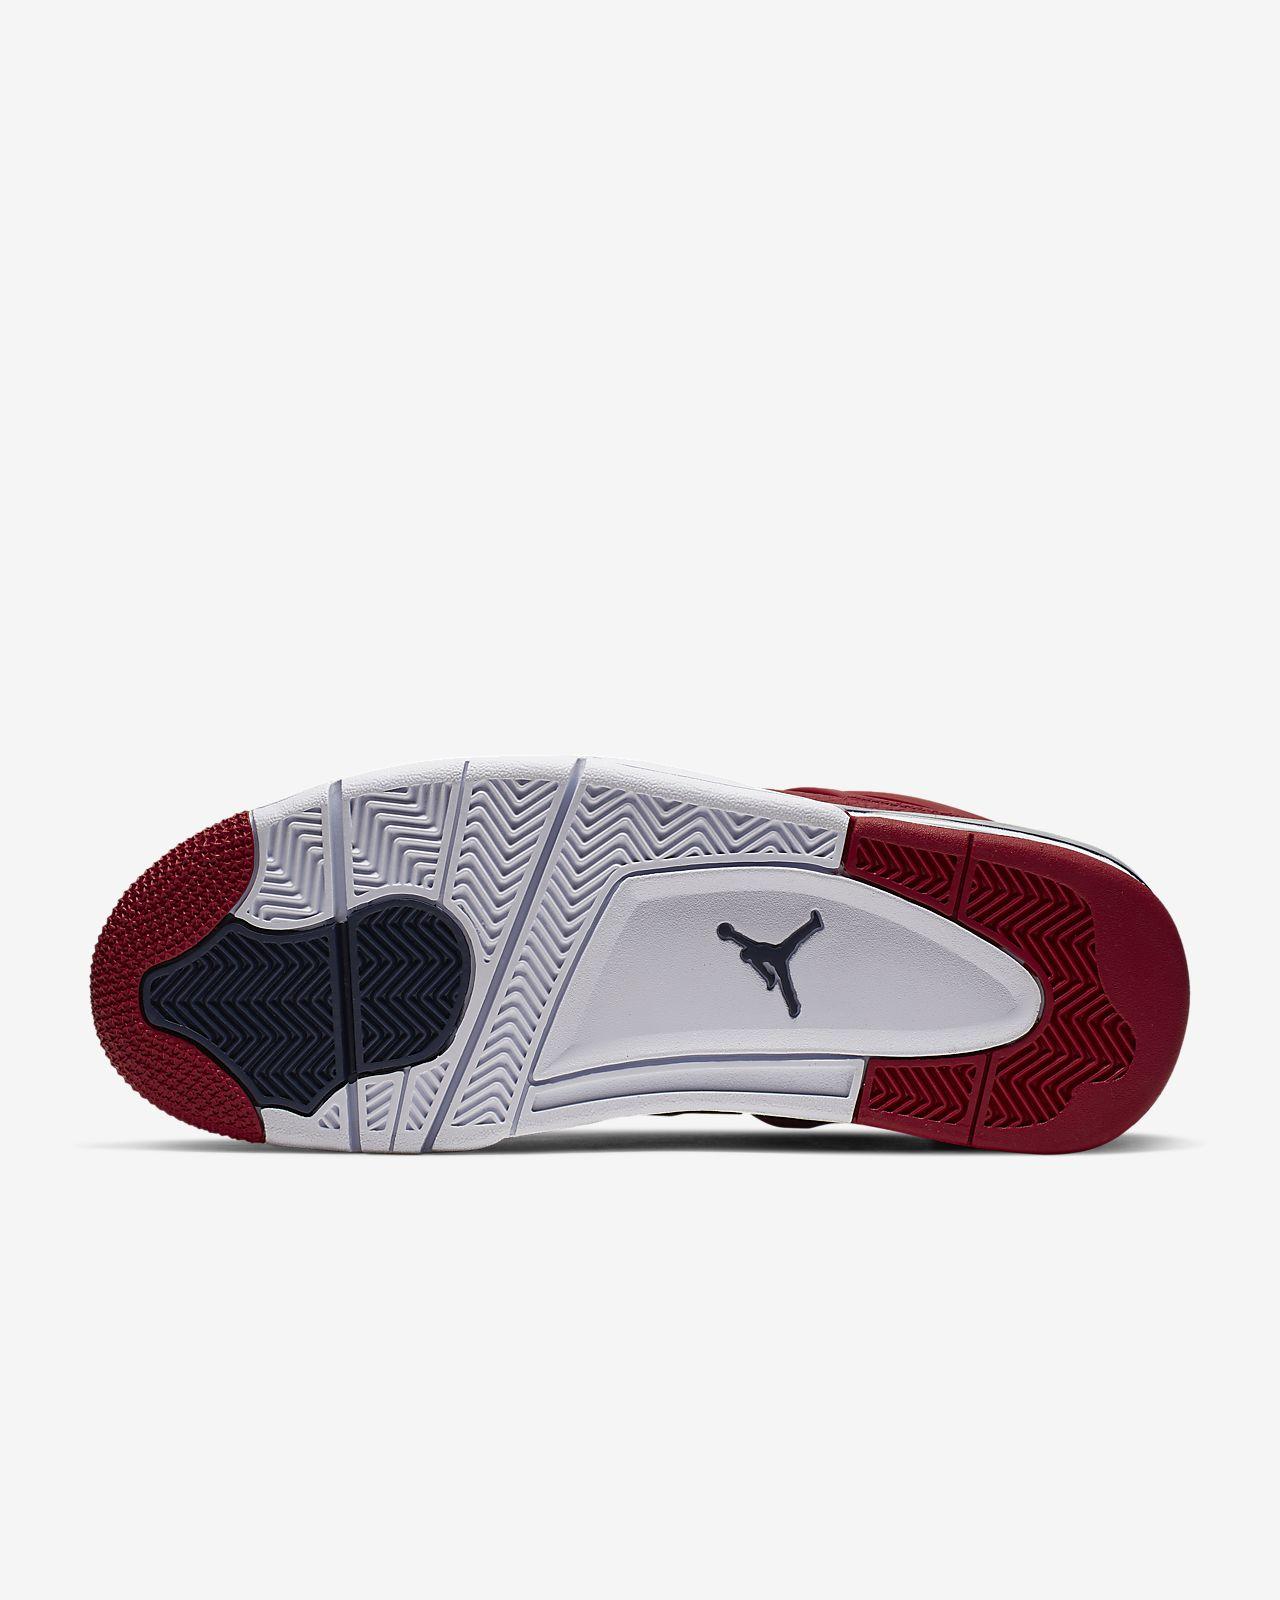 newest b47fd c4065 Air Jordan 4 Retro SE Men's Shoe